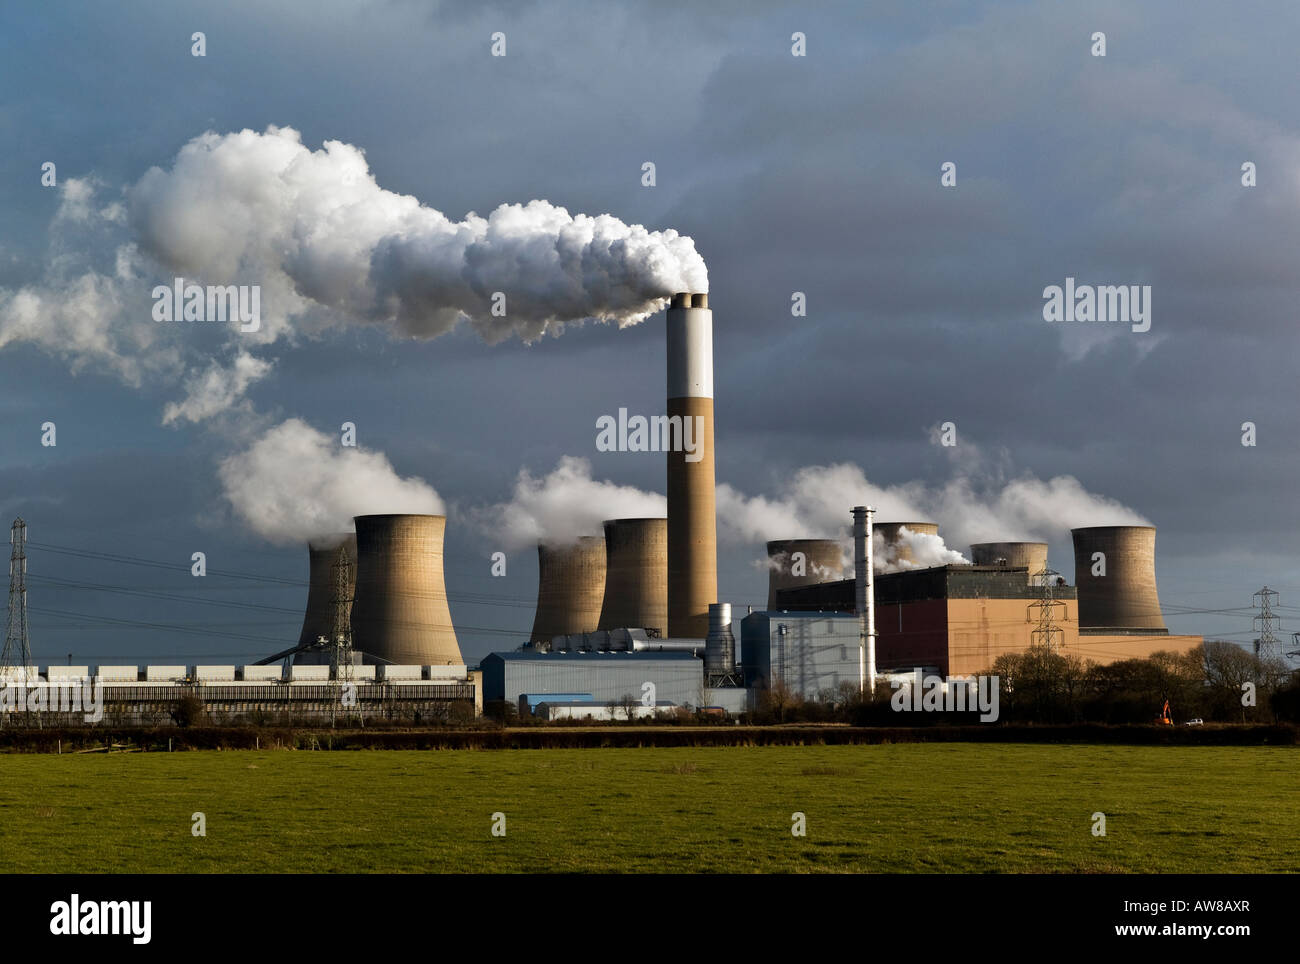 Image of Cottam Power Station - Stock Image